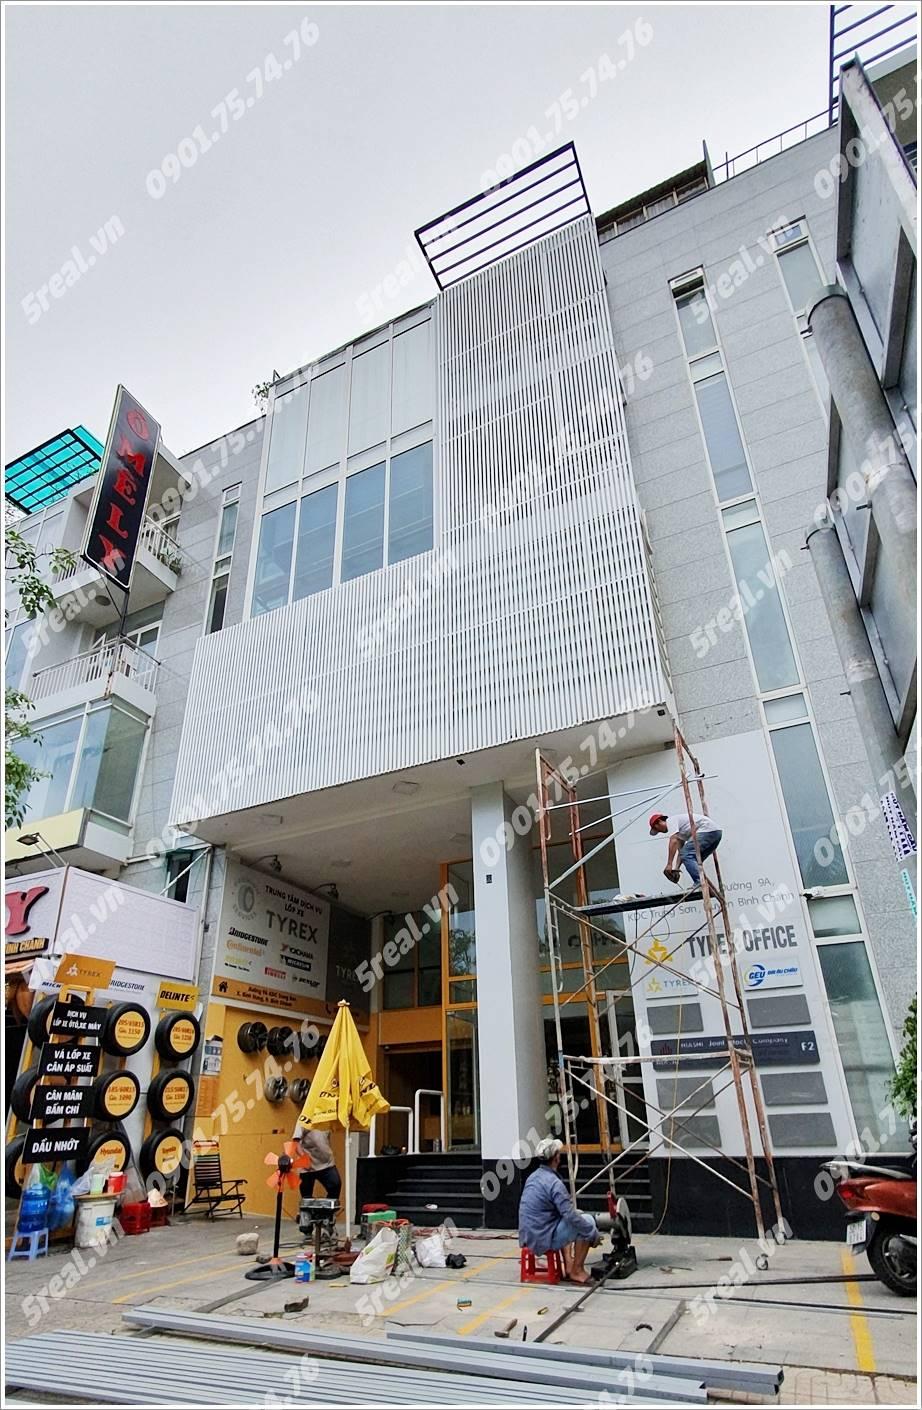 tyrex-building-duong-9a-huyen-binh-chanh-van-phong-cho-thue-tphcm-5real.vn-01